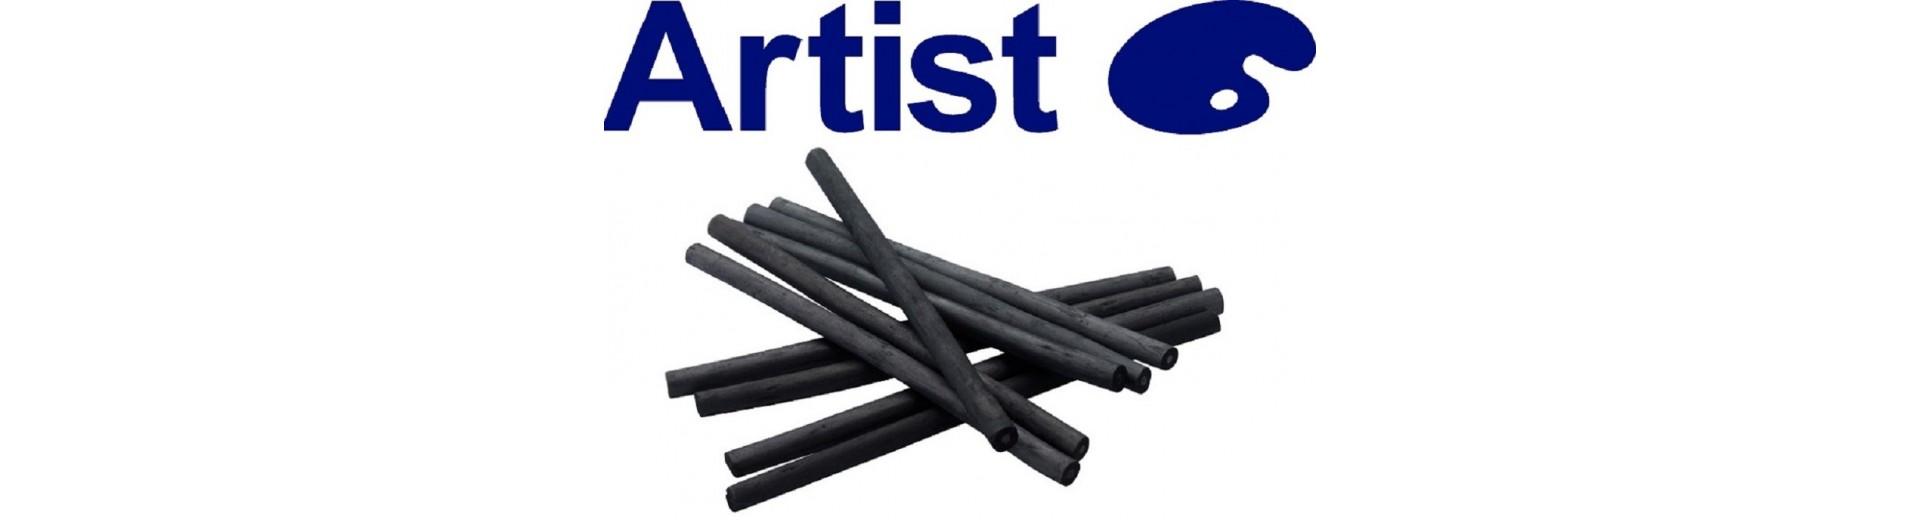 CARBONCILLOS ARTIST